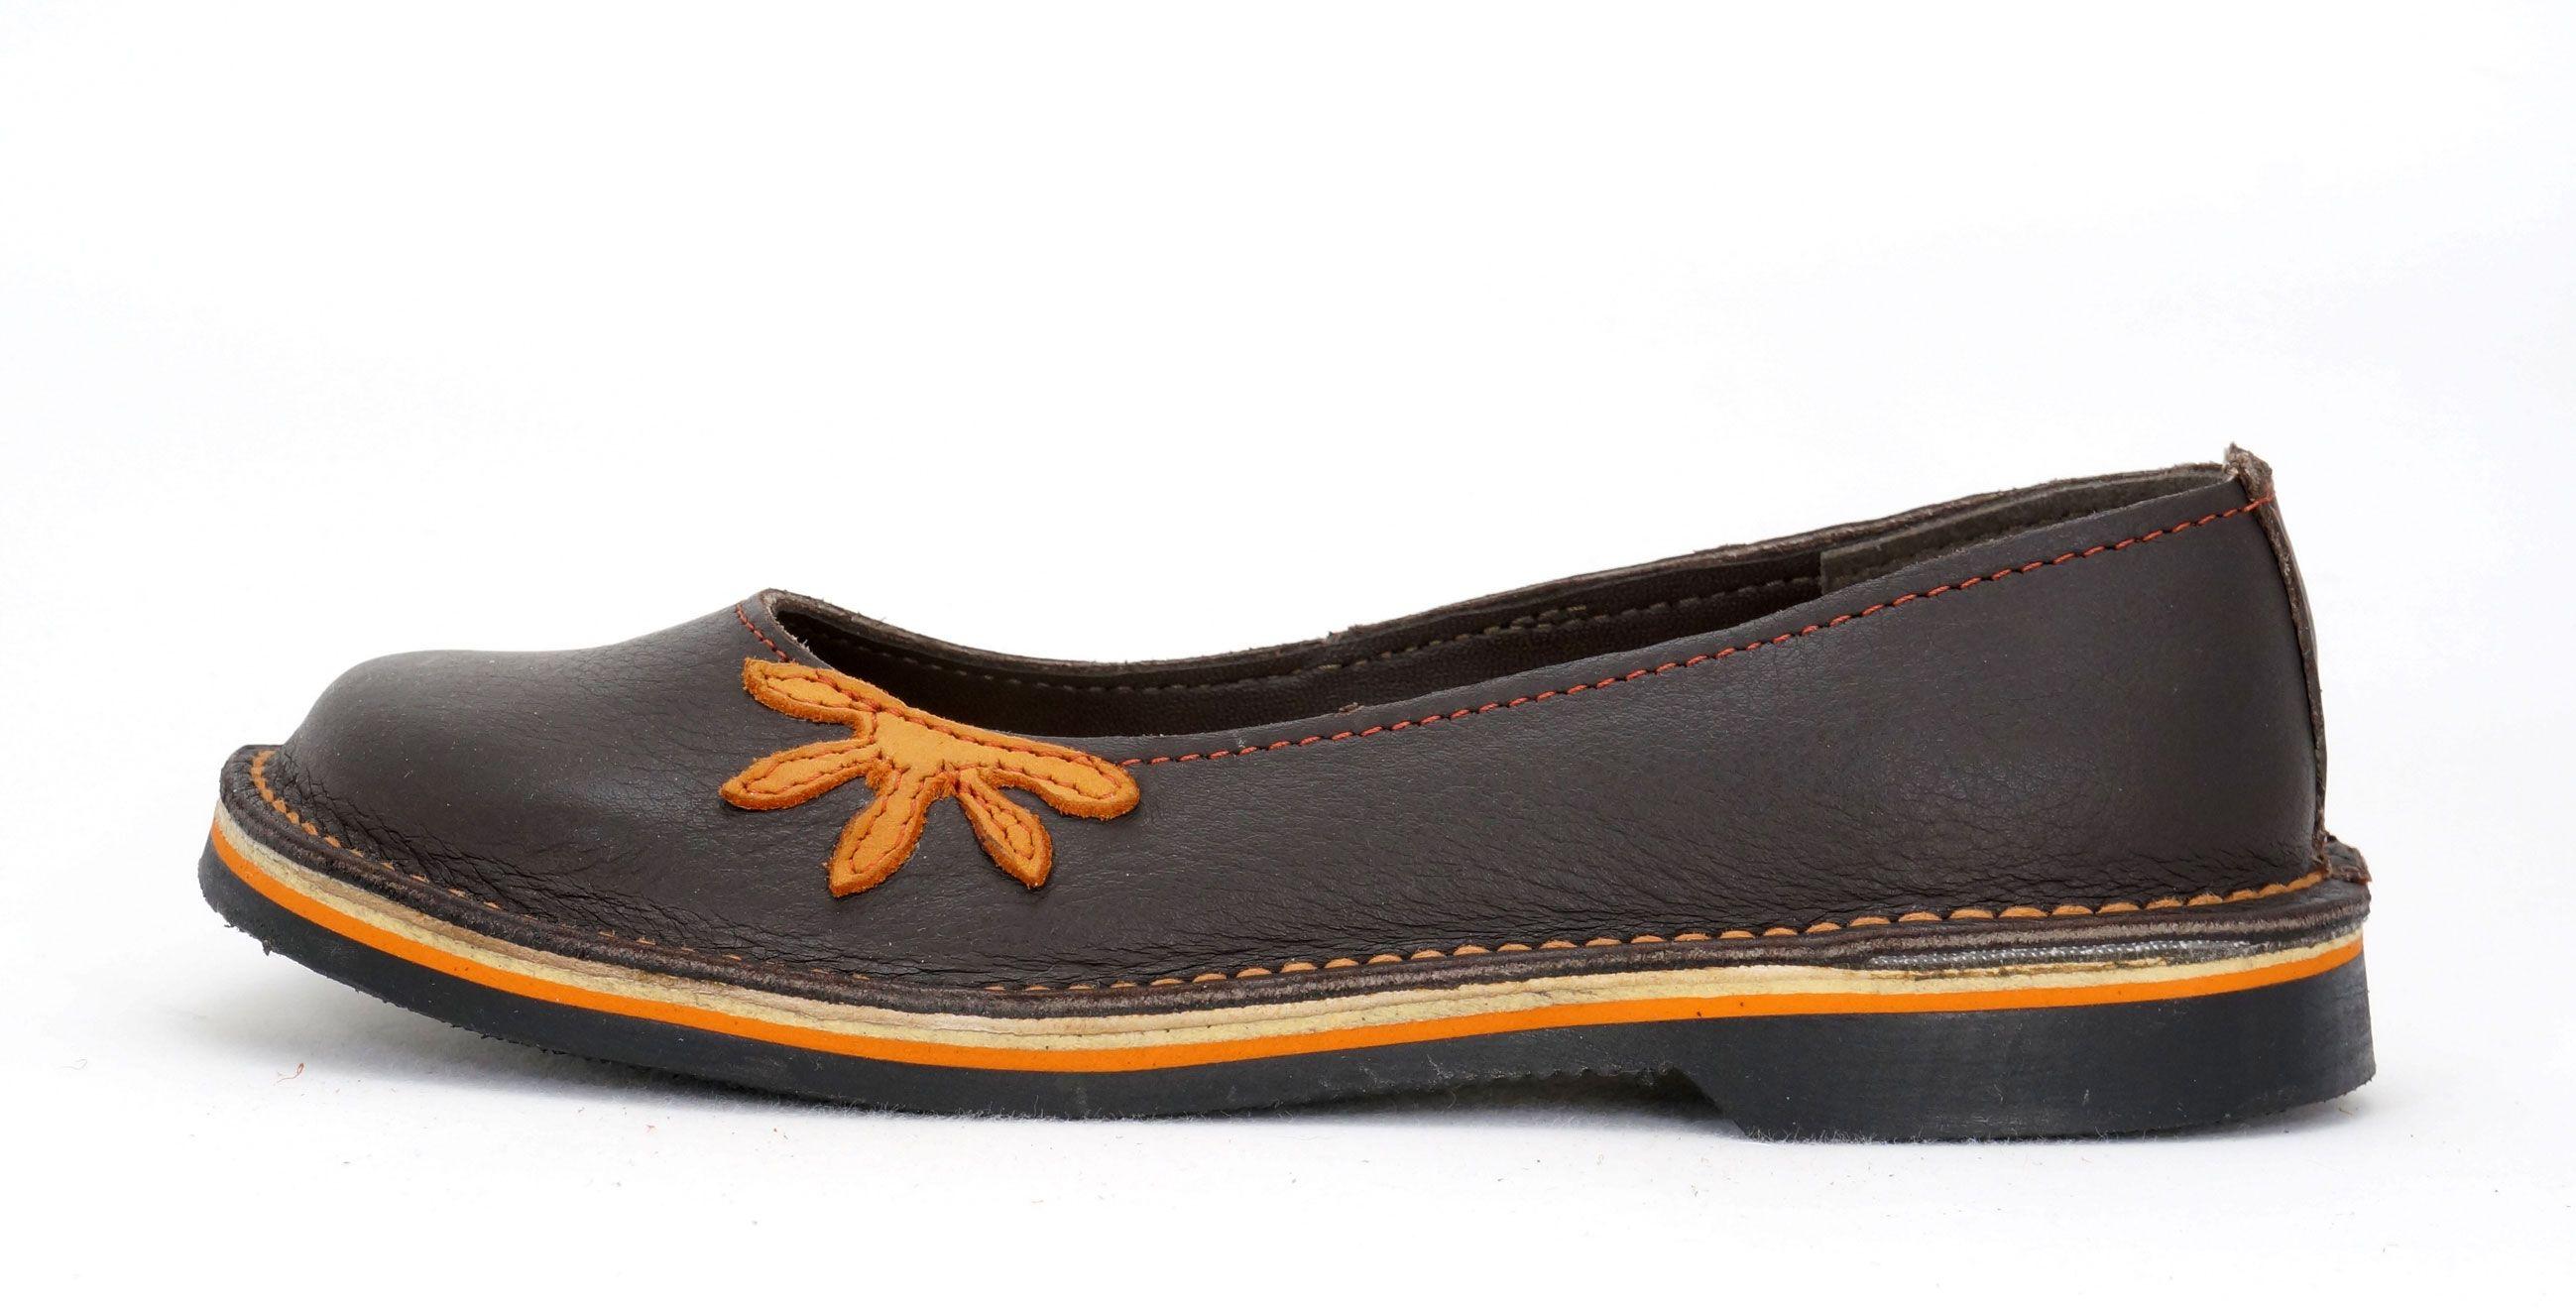 Freestyle Roberta Bundu Oxblood Orange Handcrafted Genuine Leather Shoes Leather Shoes Woman Genuine Leather Shoes Leather